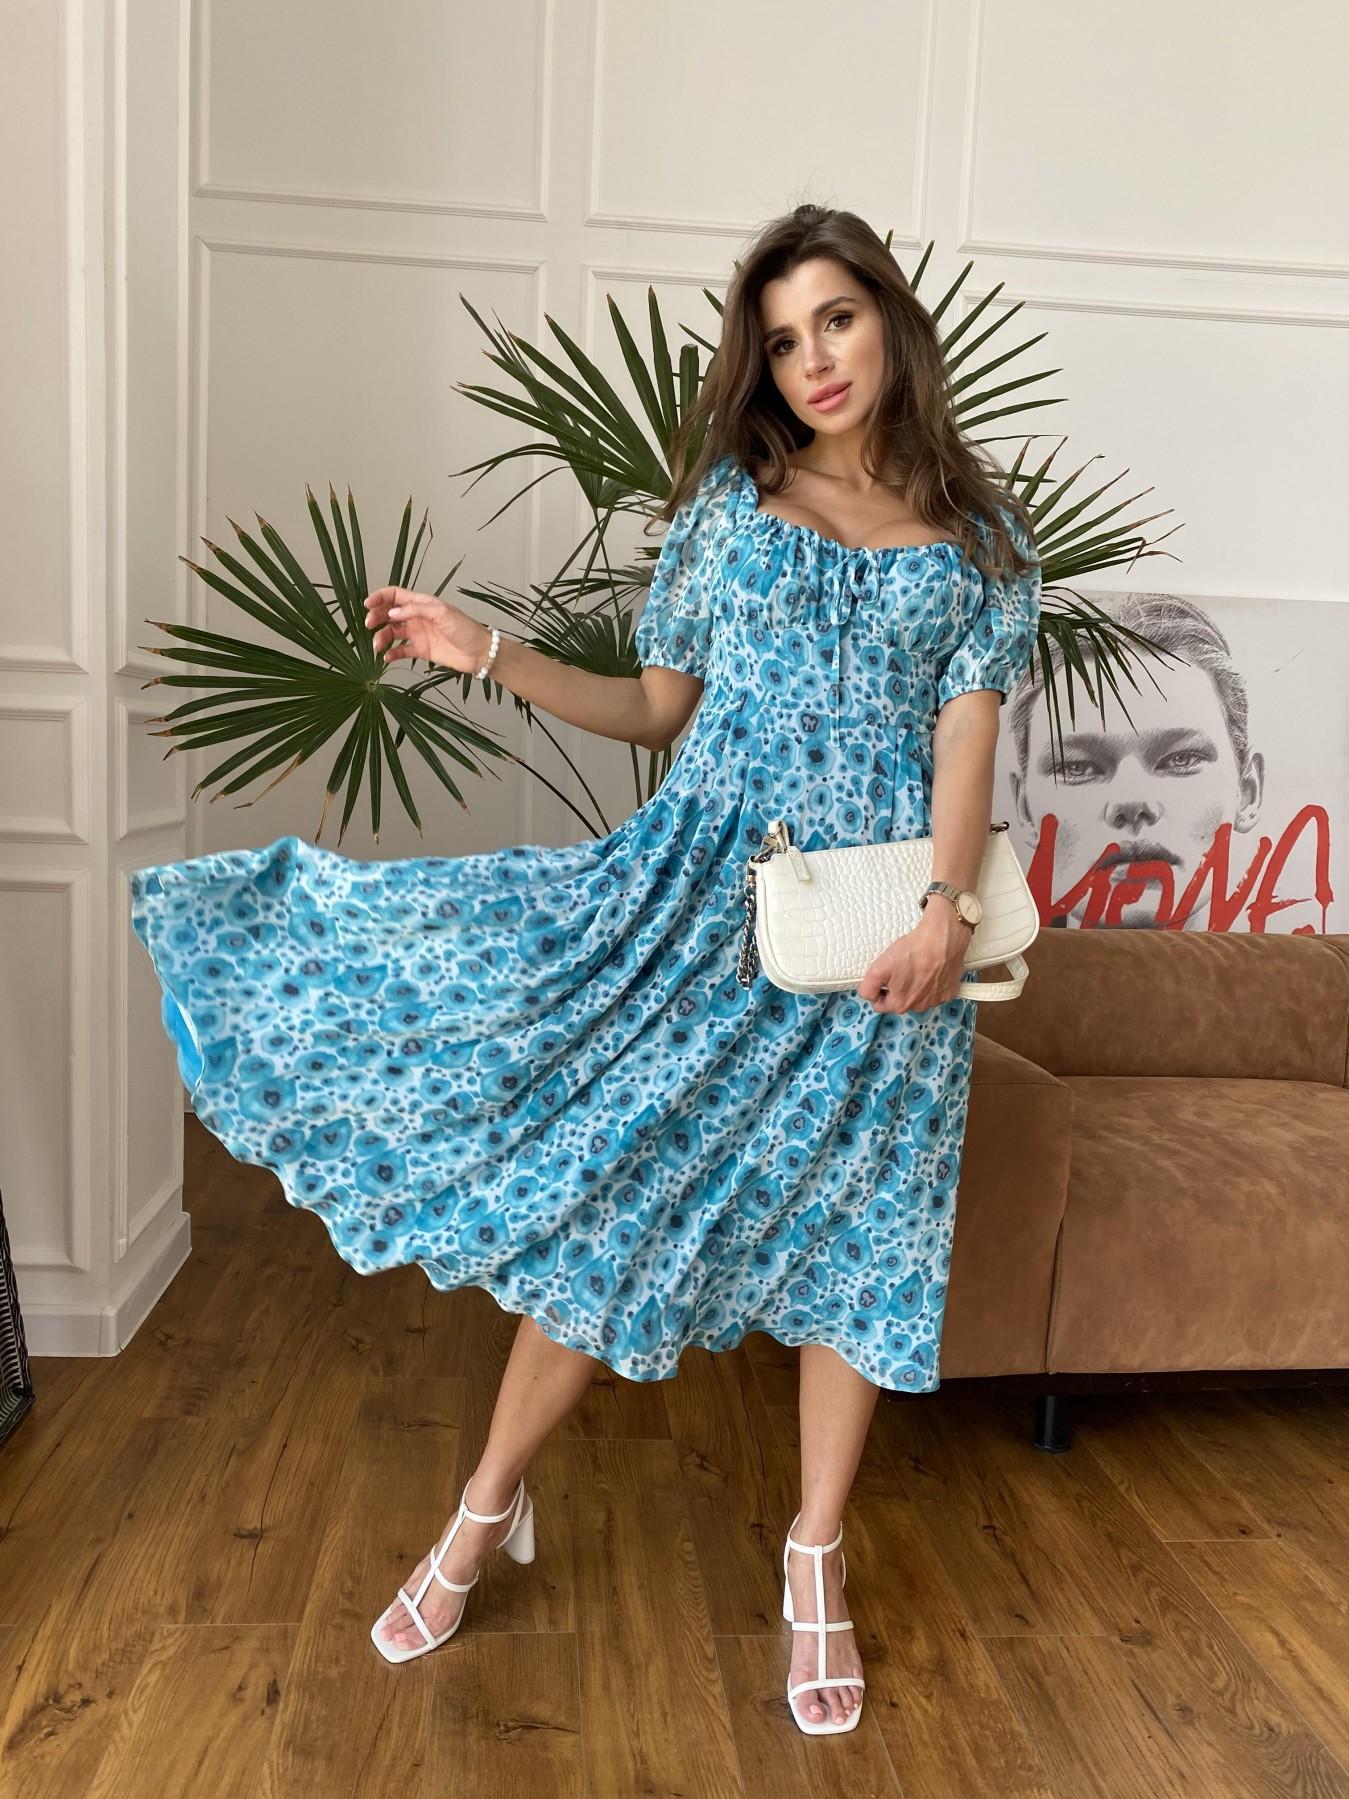 Кисес Миди платье из креп шифона в принт 11575 АРТ. 48269 Цвет: Маки/ Бирюза - фото 3, интернет магазин tm-modus.ru